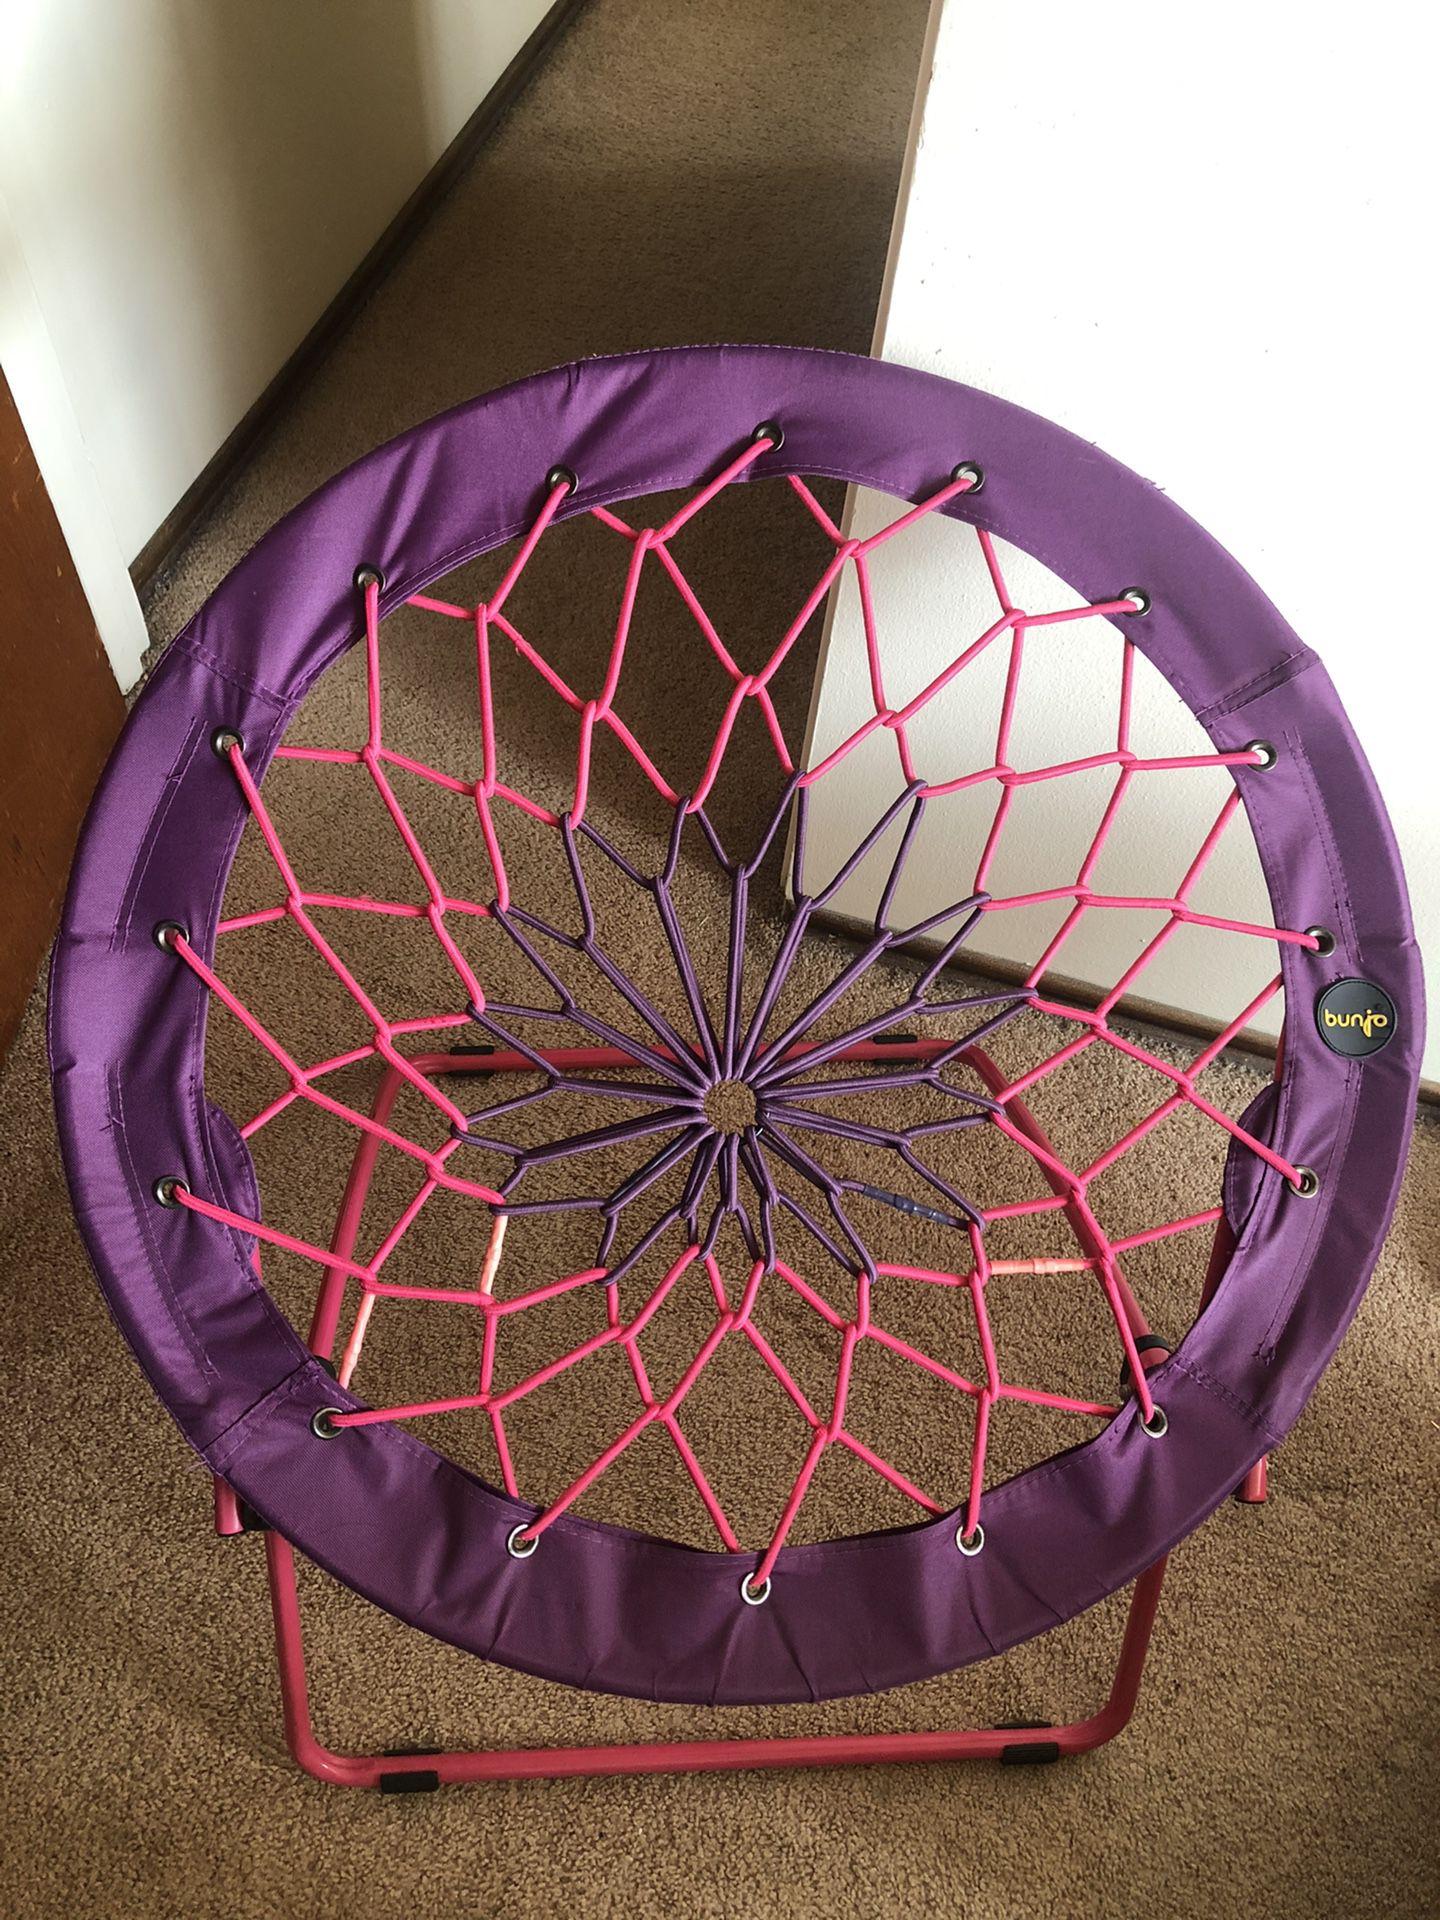 Bunjo Bungee Chair (purple/pink)